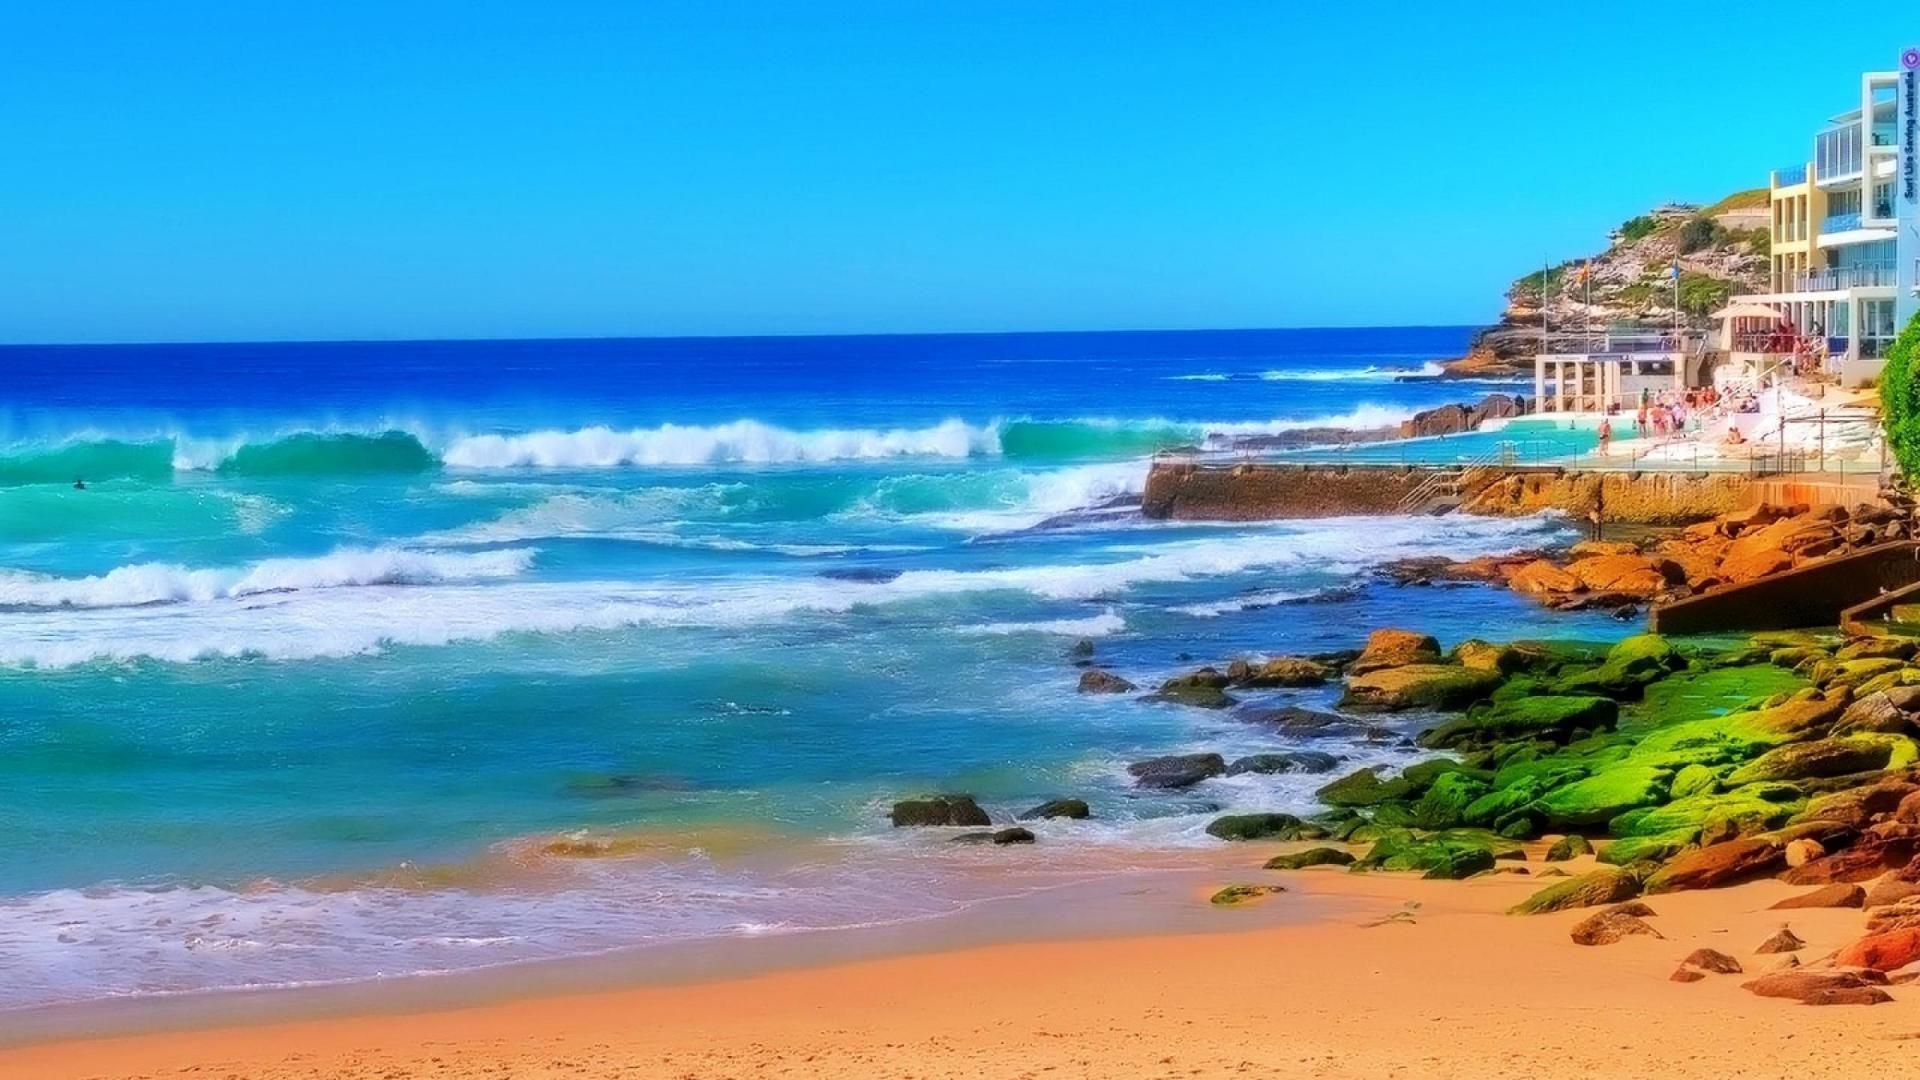 Free Download Beach Wallpapers 1080p Wallpaper Wallpaper Hd